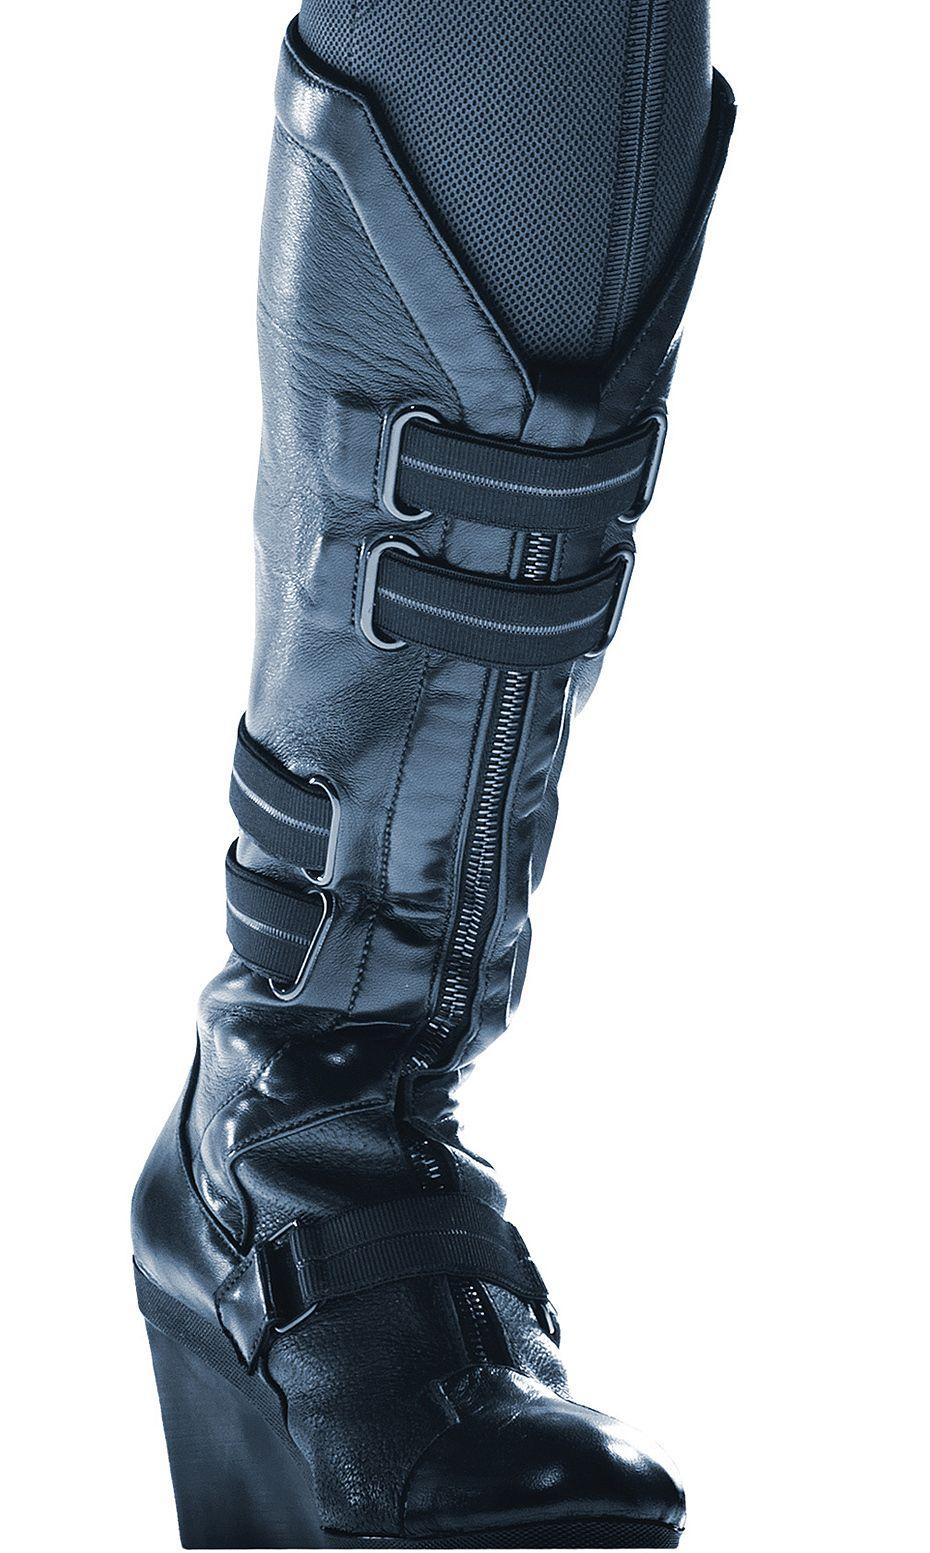 Boot details 1 black widow costume black widow cosplay